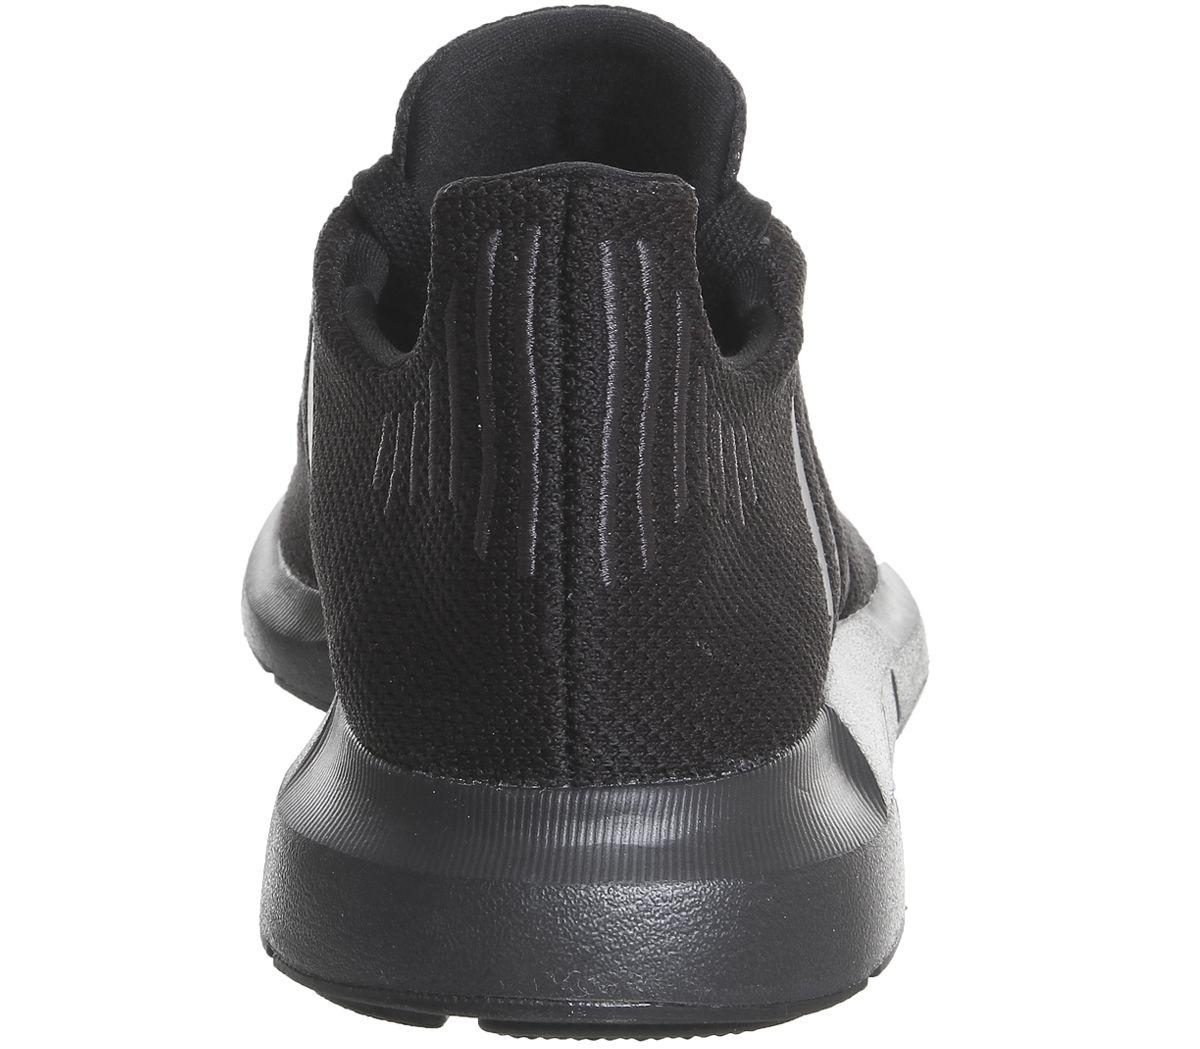 d8d33b2e81204 adidas Swift Run Black Mono - Hers trainers